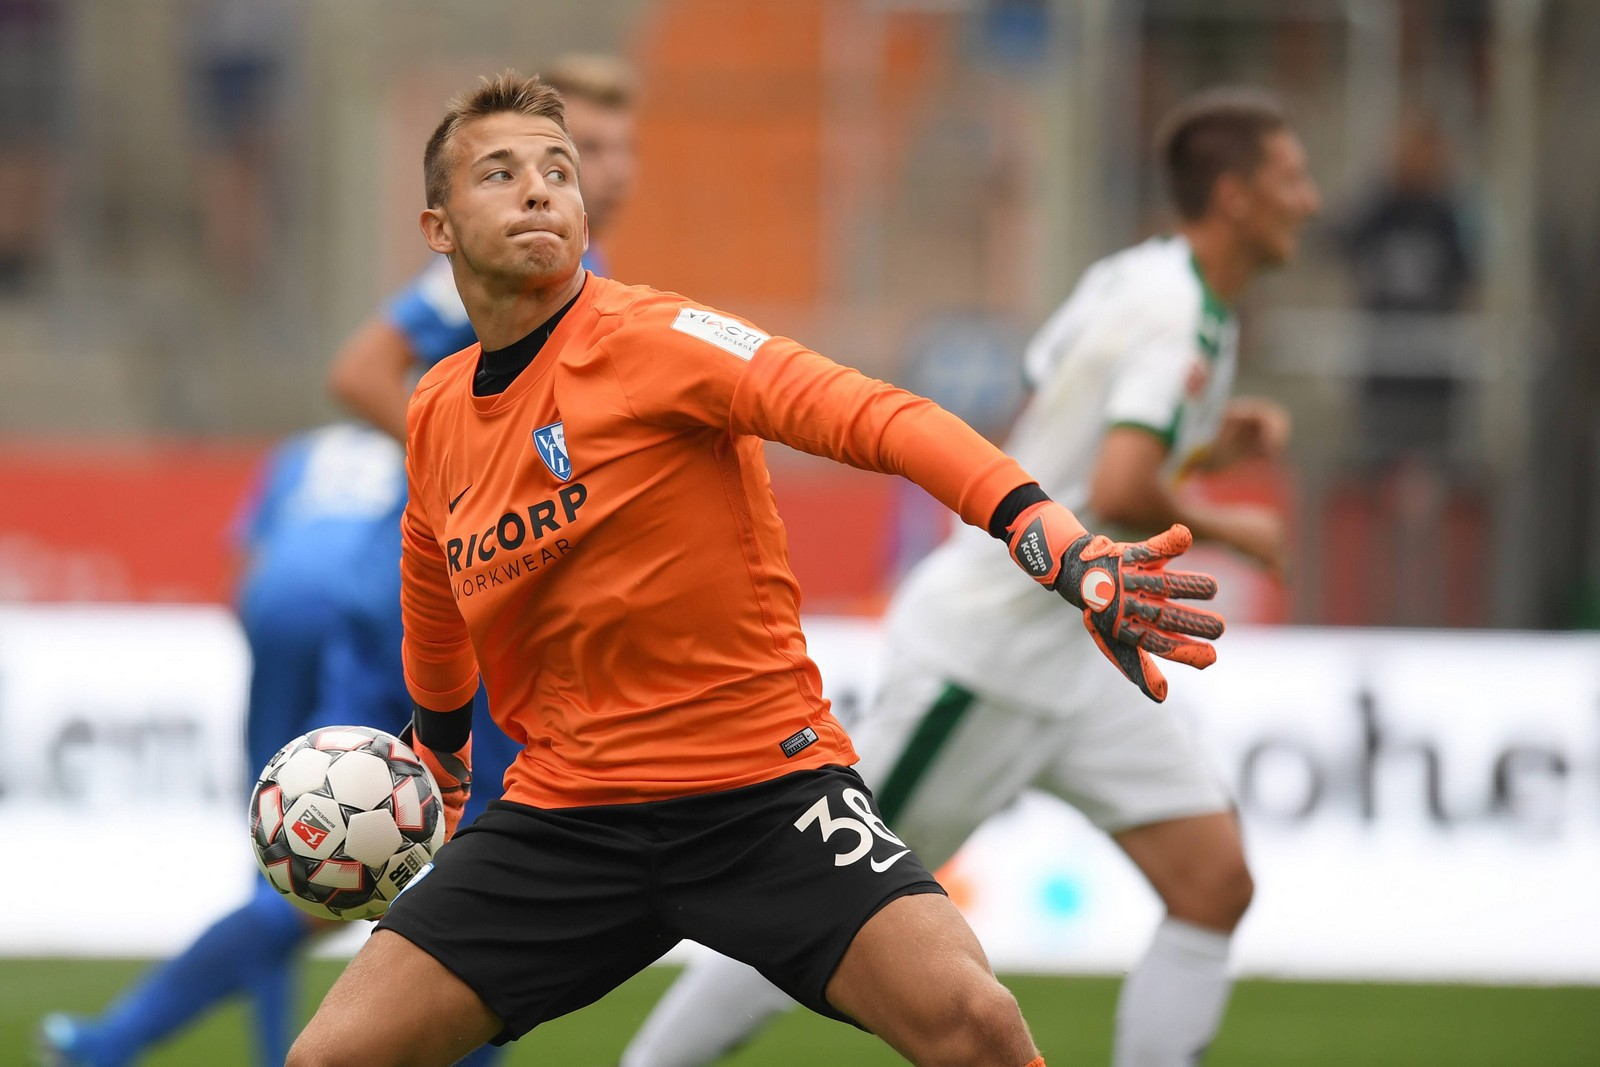 Florian Kraft im Trikot des VfL Bochum